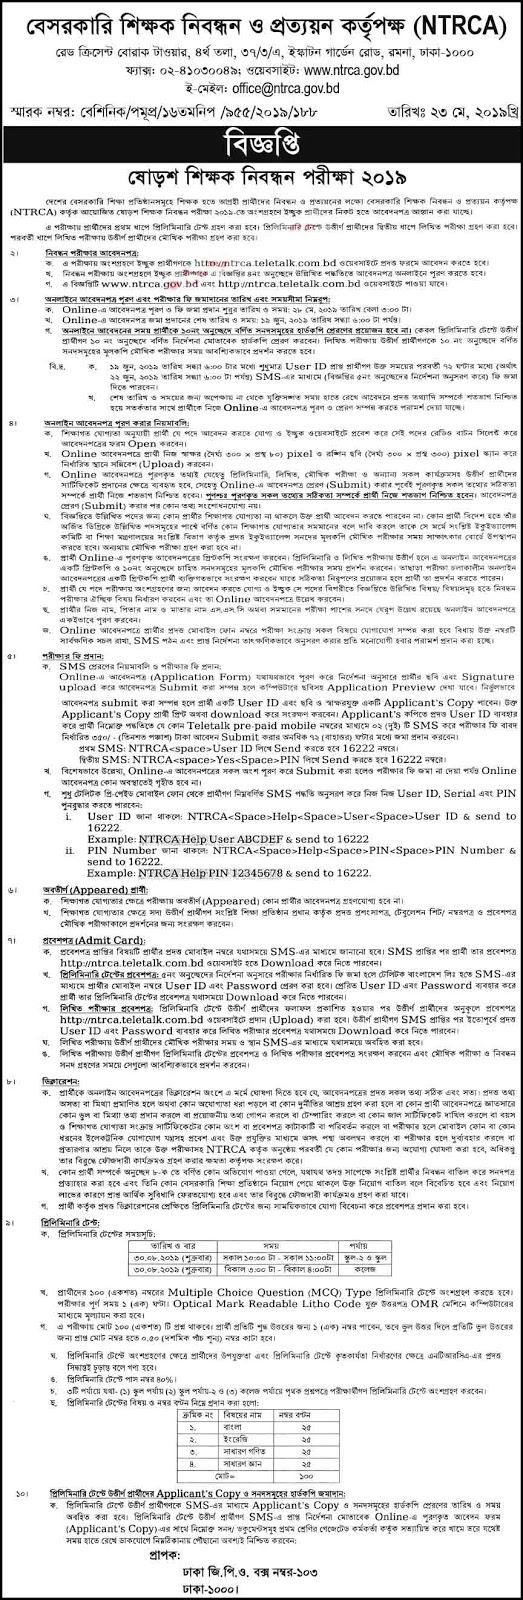 NTRCA Job Circular 2019